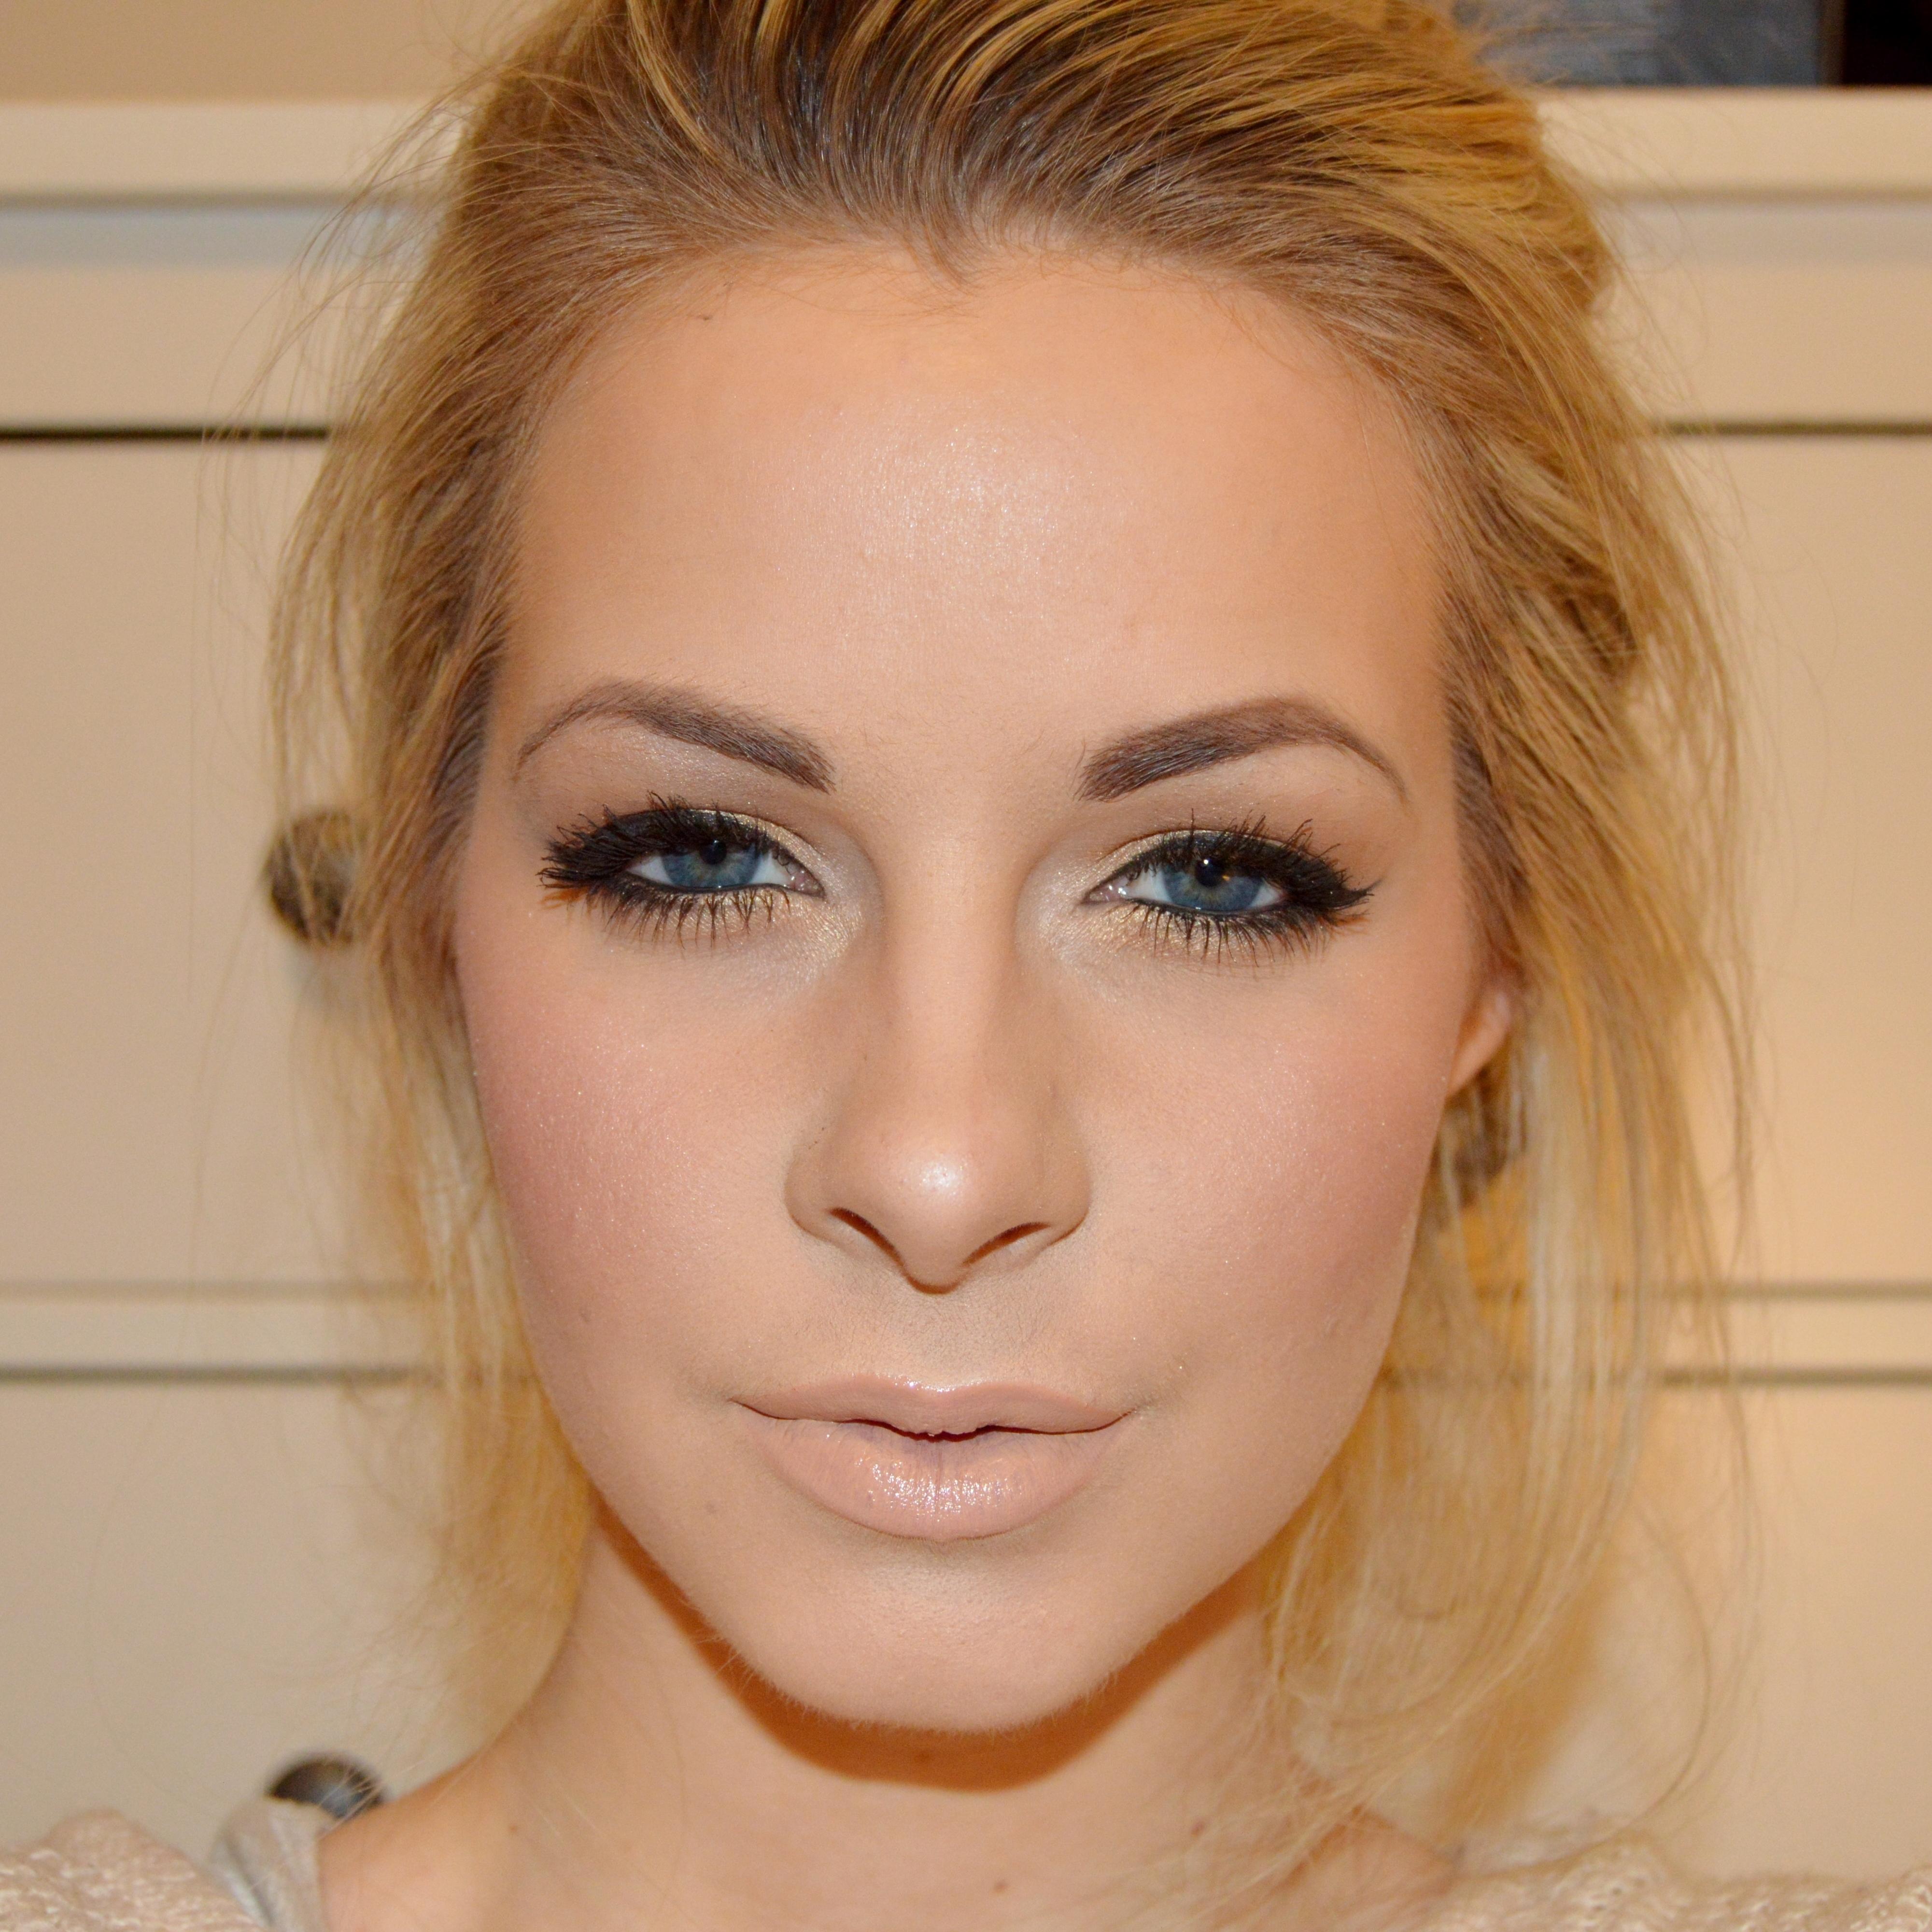 Flawless Skin: Graftobian HD Foundation: Flawless Skin//Nude Lips